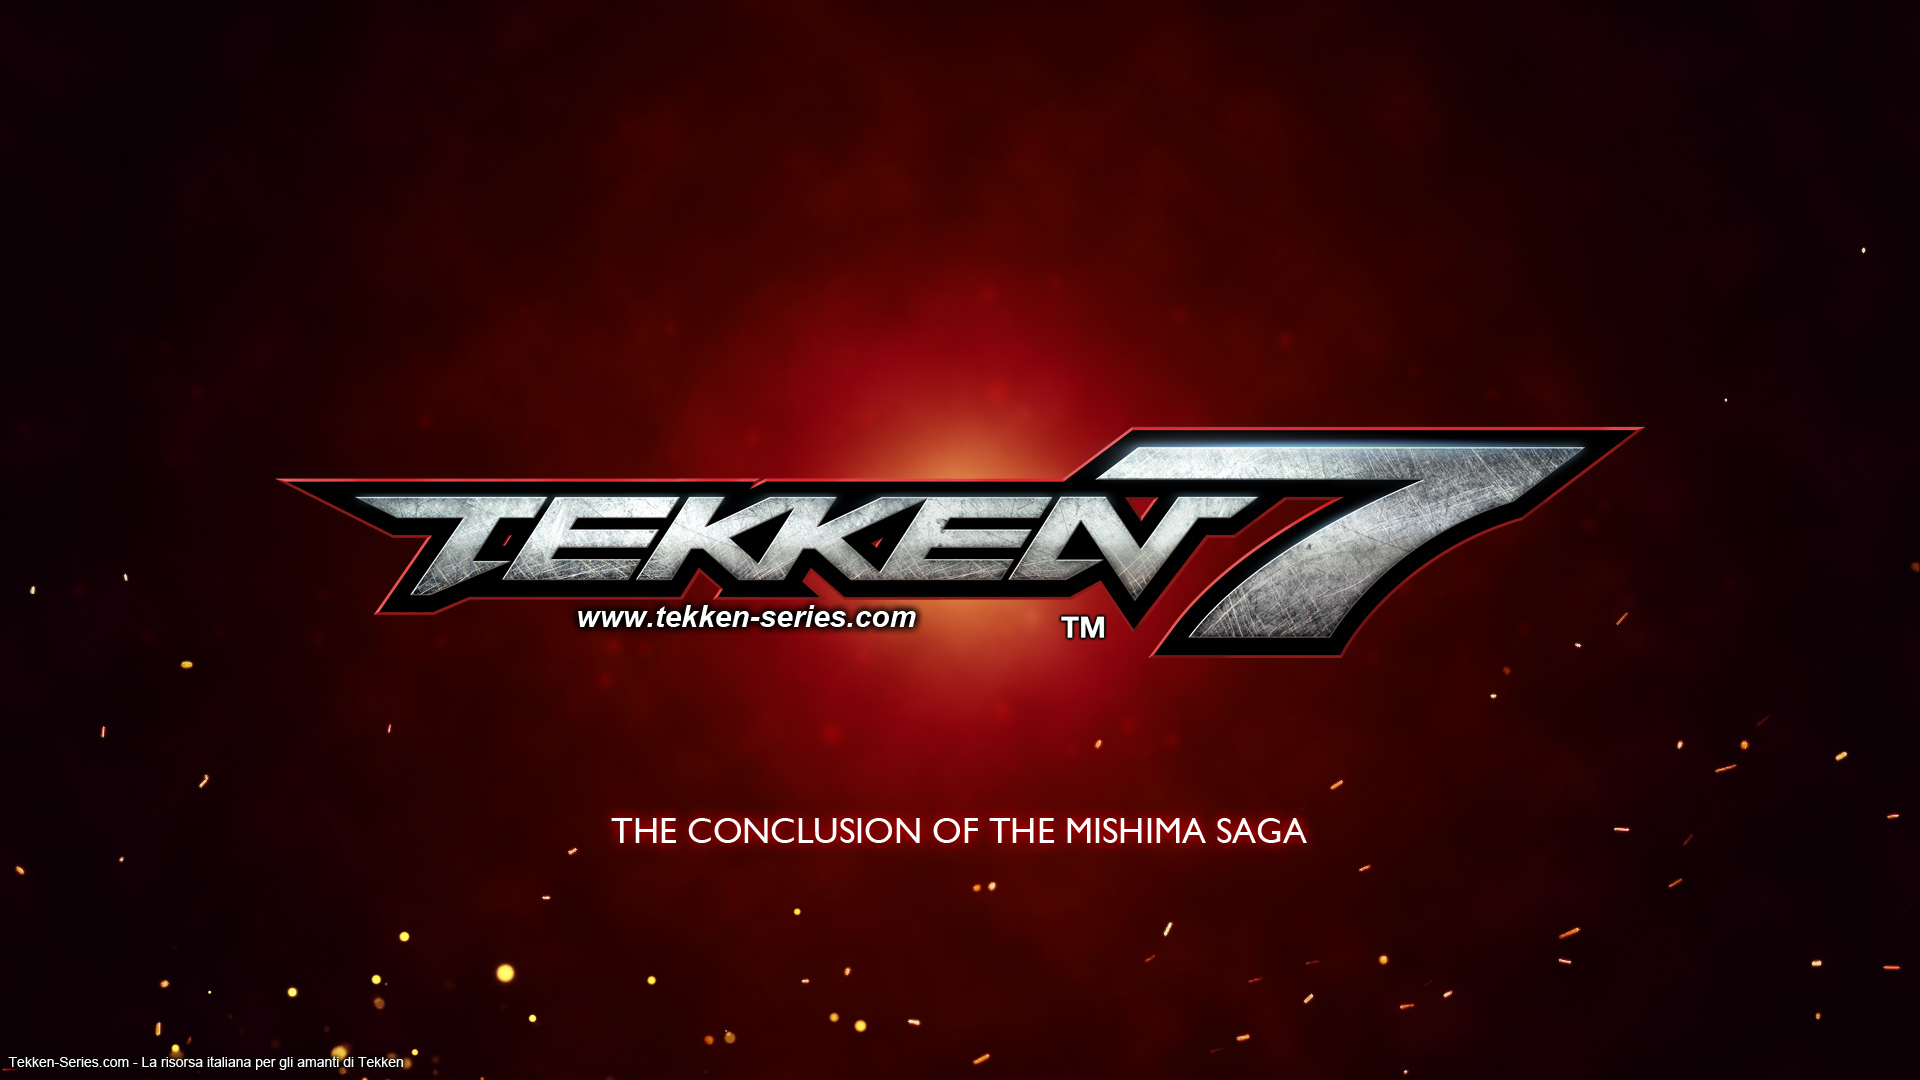 tekken7-main-title-wallpaper.jpg